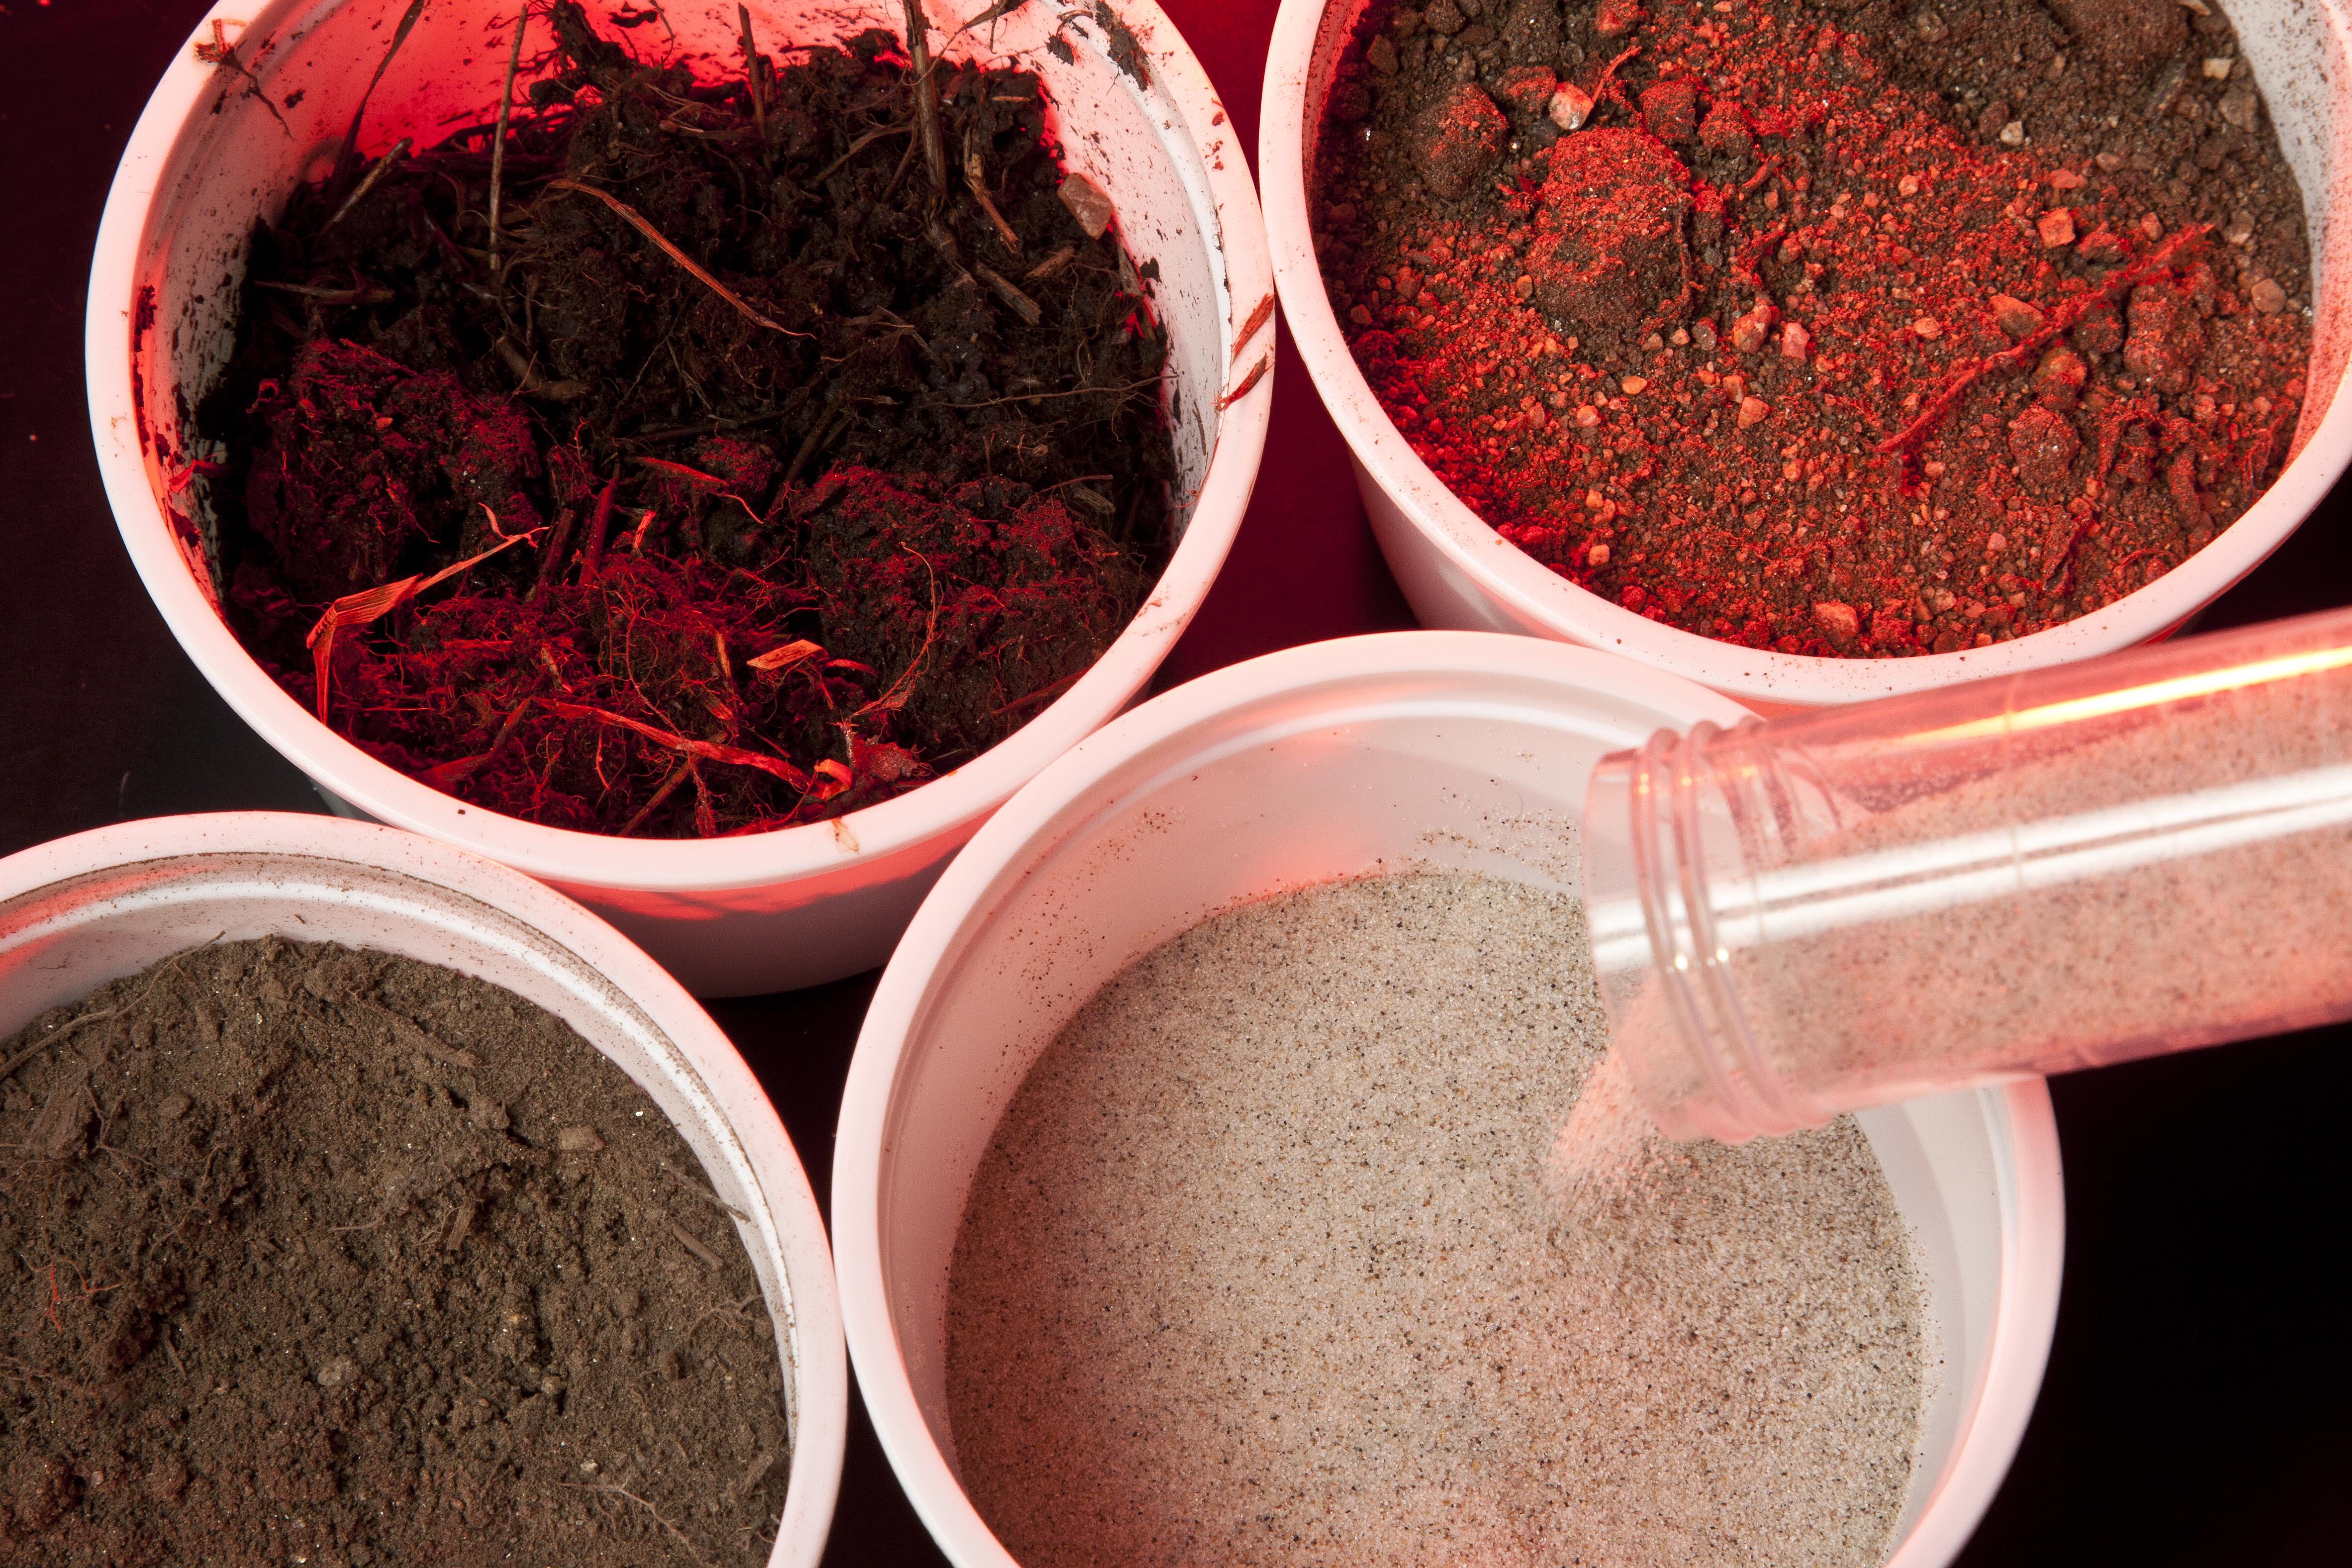 Various soil samples